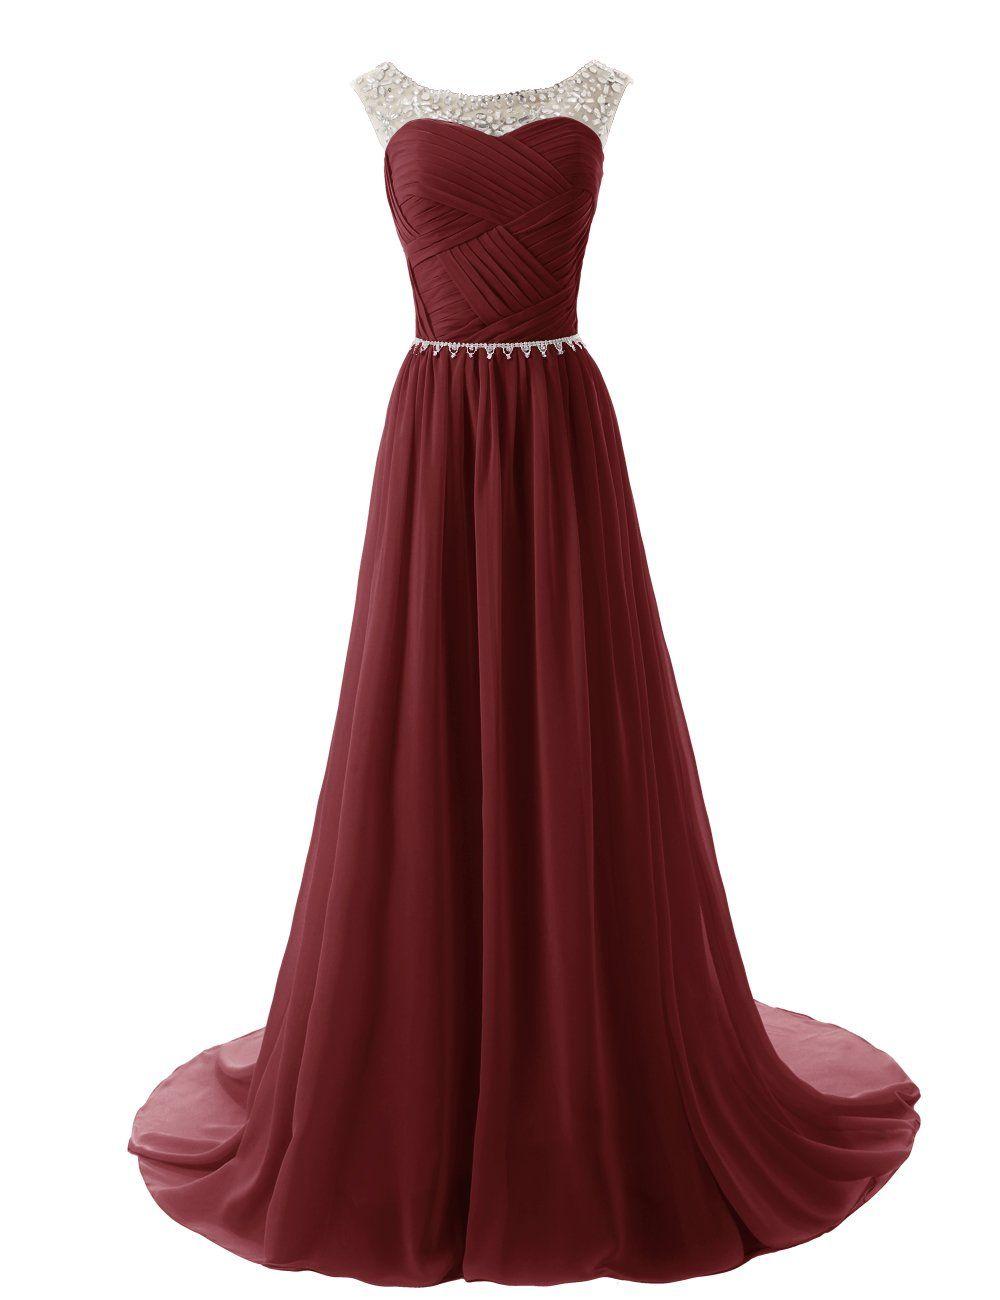 Dressystar chiffon dress long bridesmaid dress beading ball gown